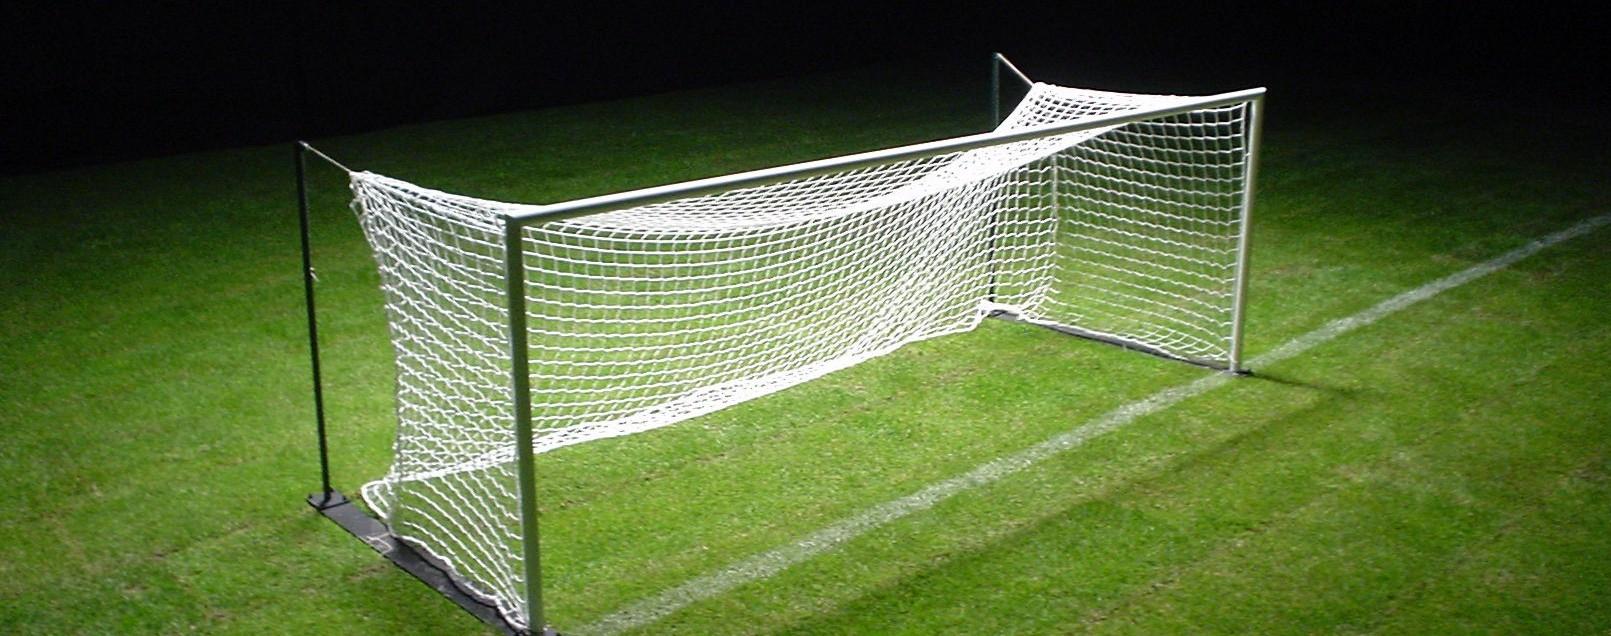 Euro Goal Free Standing